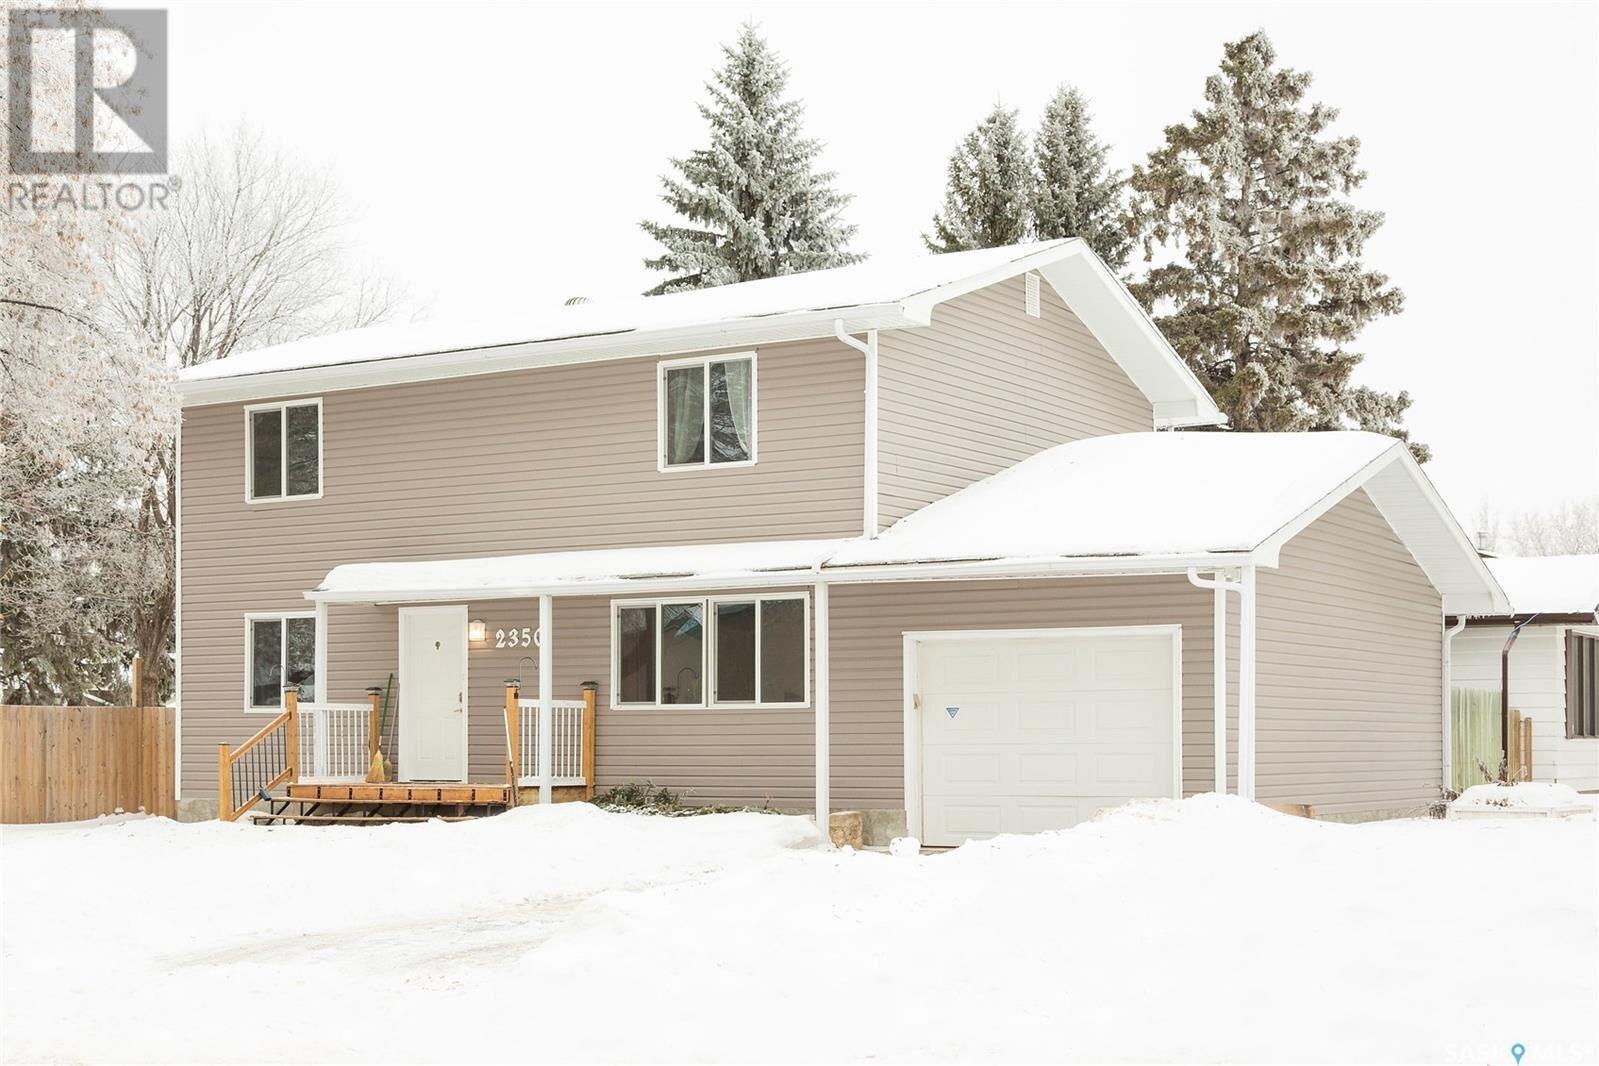 House for sale at 2350 7th Ave W Prince Albert Saskatchewan - MLS: SK823525